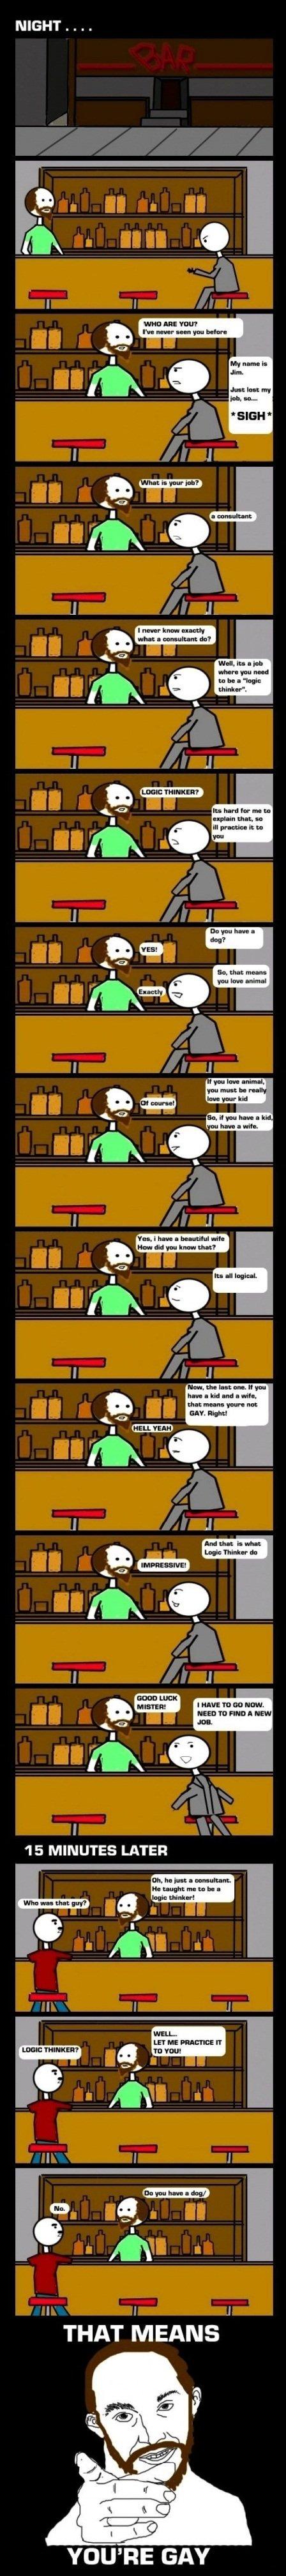 logic. hahahaha.. RRRRRRREEEEEEEEEEEEEEEEEEEEEEEEPPPPPOOOOOOOOOOOOOOOOOOOOOSSSSSTTTT!! YOU FAG! best logic